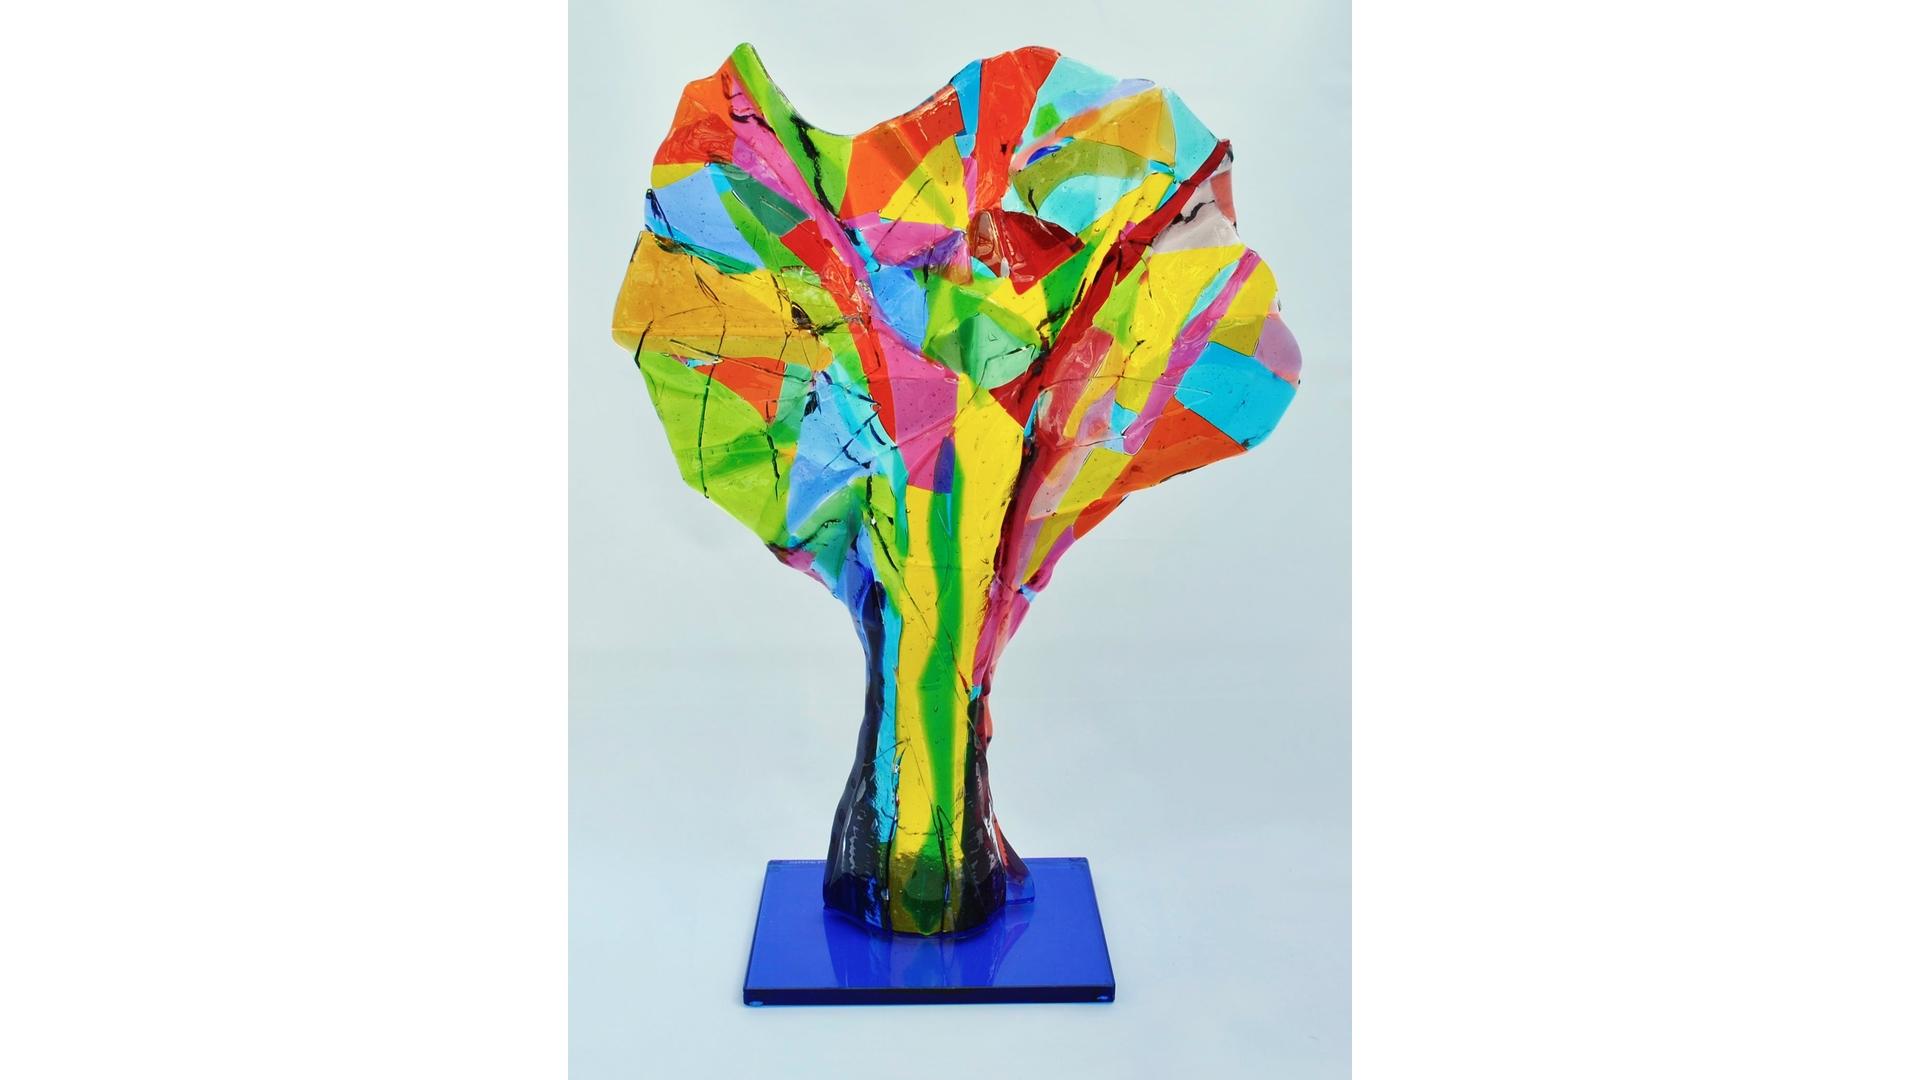 Titel: 'Queen', Bullseye glas 35x46 cm Atelier Angenelle Thijssen